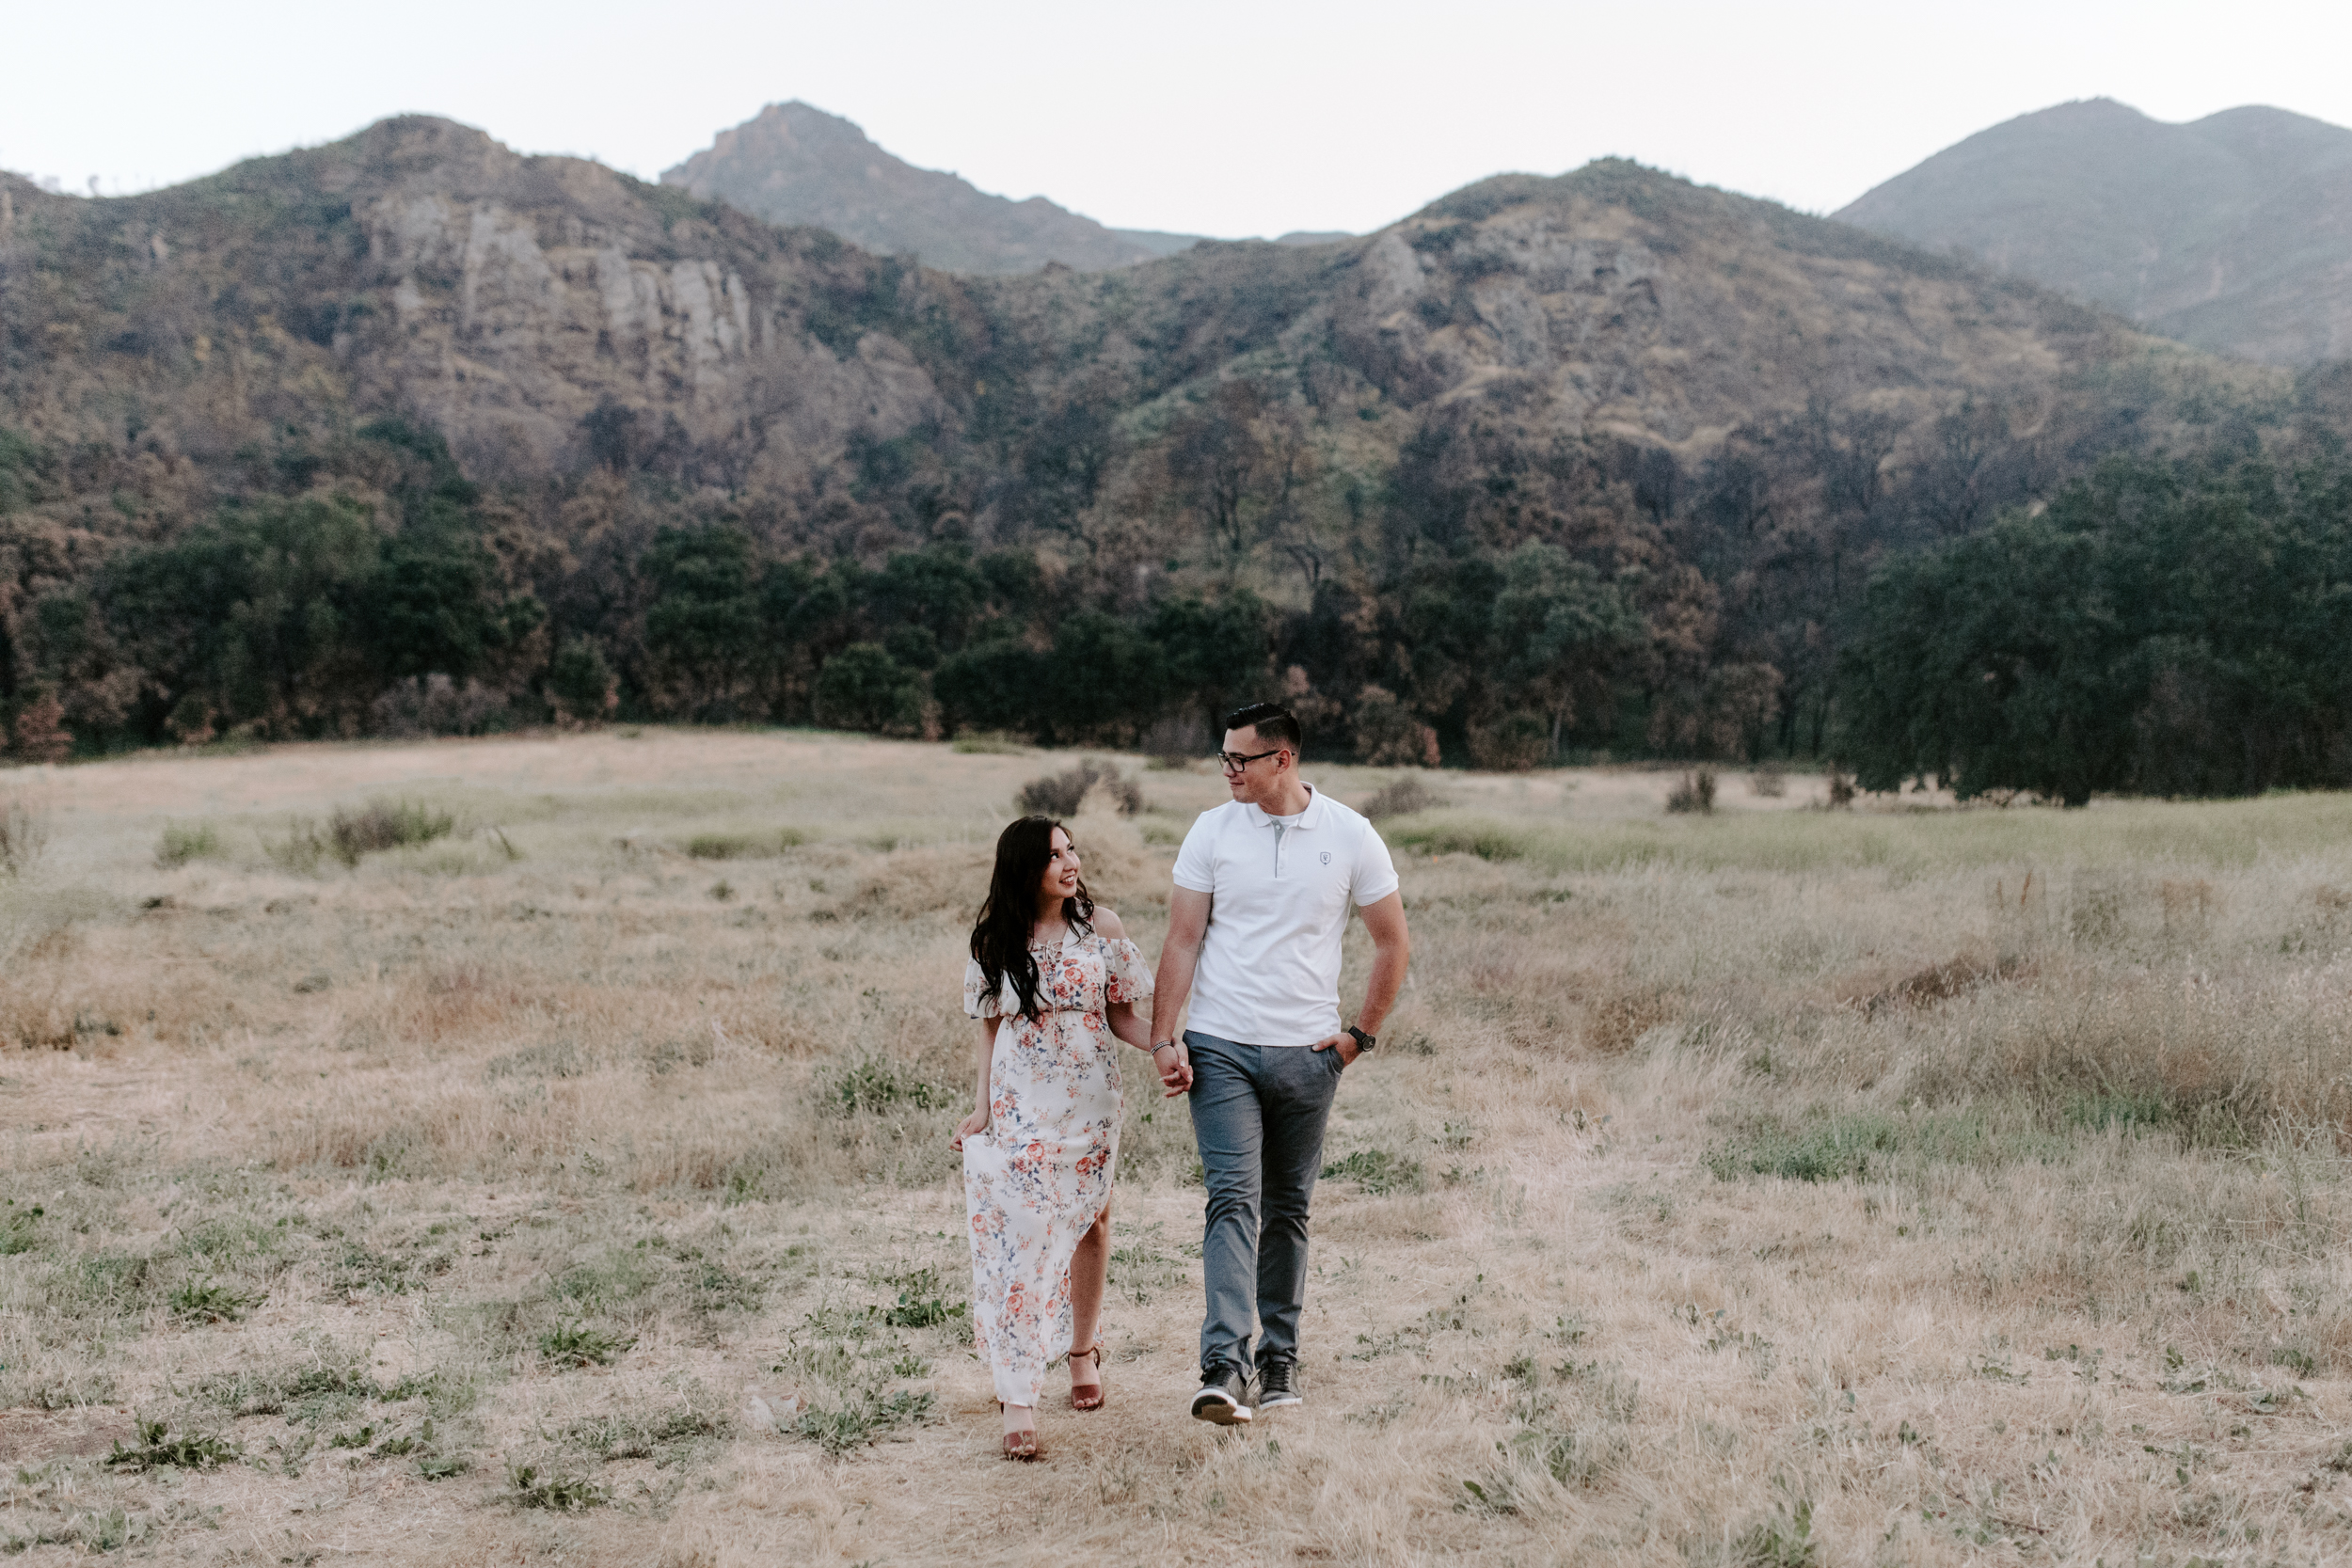 Katelyn Faye Photography | www.katelynfaye.com | Las Vegas Wedding Photographer | Malibu Creek State Park Engagements | J&N (25 of 33).jpg